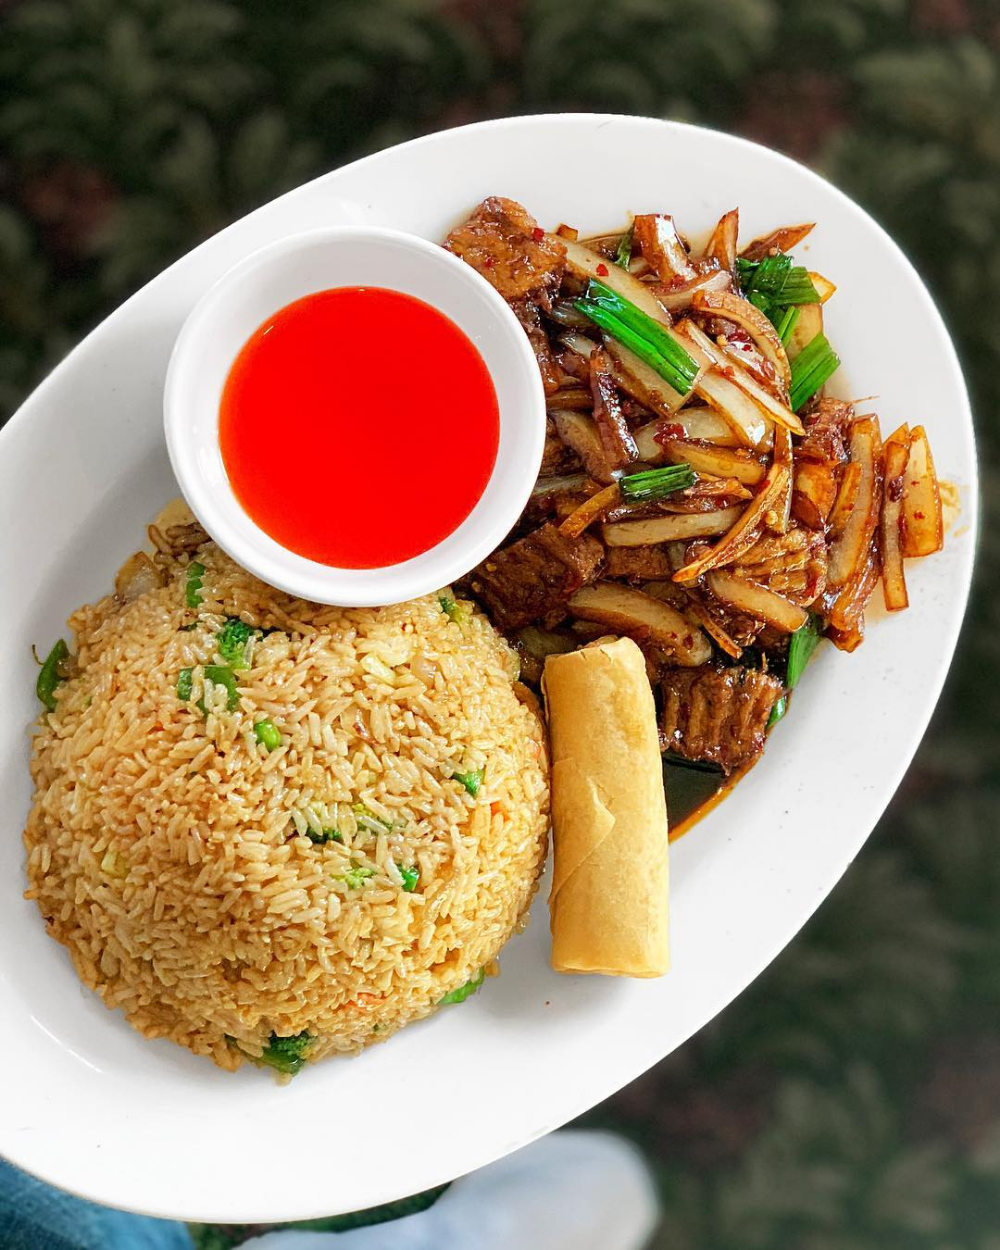 An Essential Guide To Restaurants Serving Vegetarian And Vegan Food In Detroit Chinese Restaurant Food Vegan Recipes